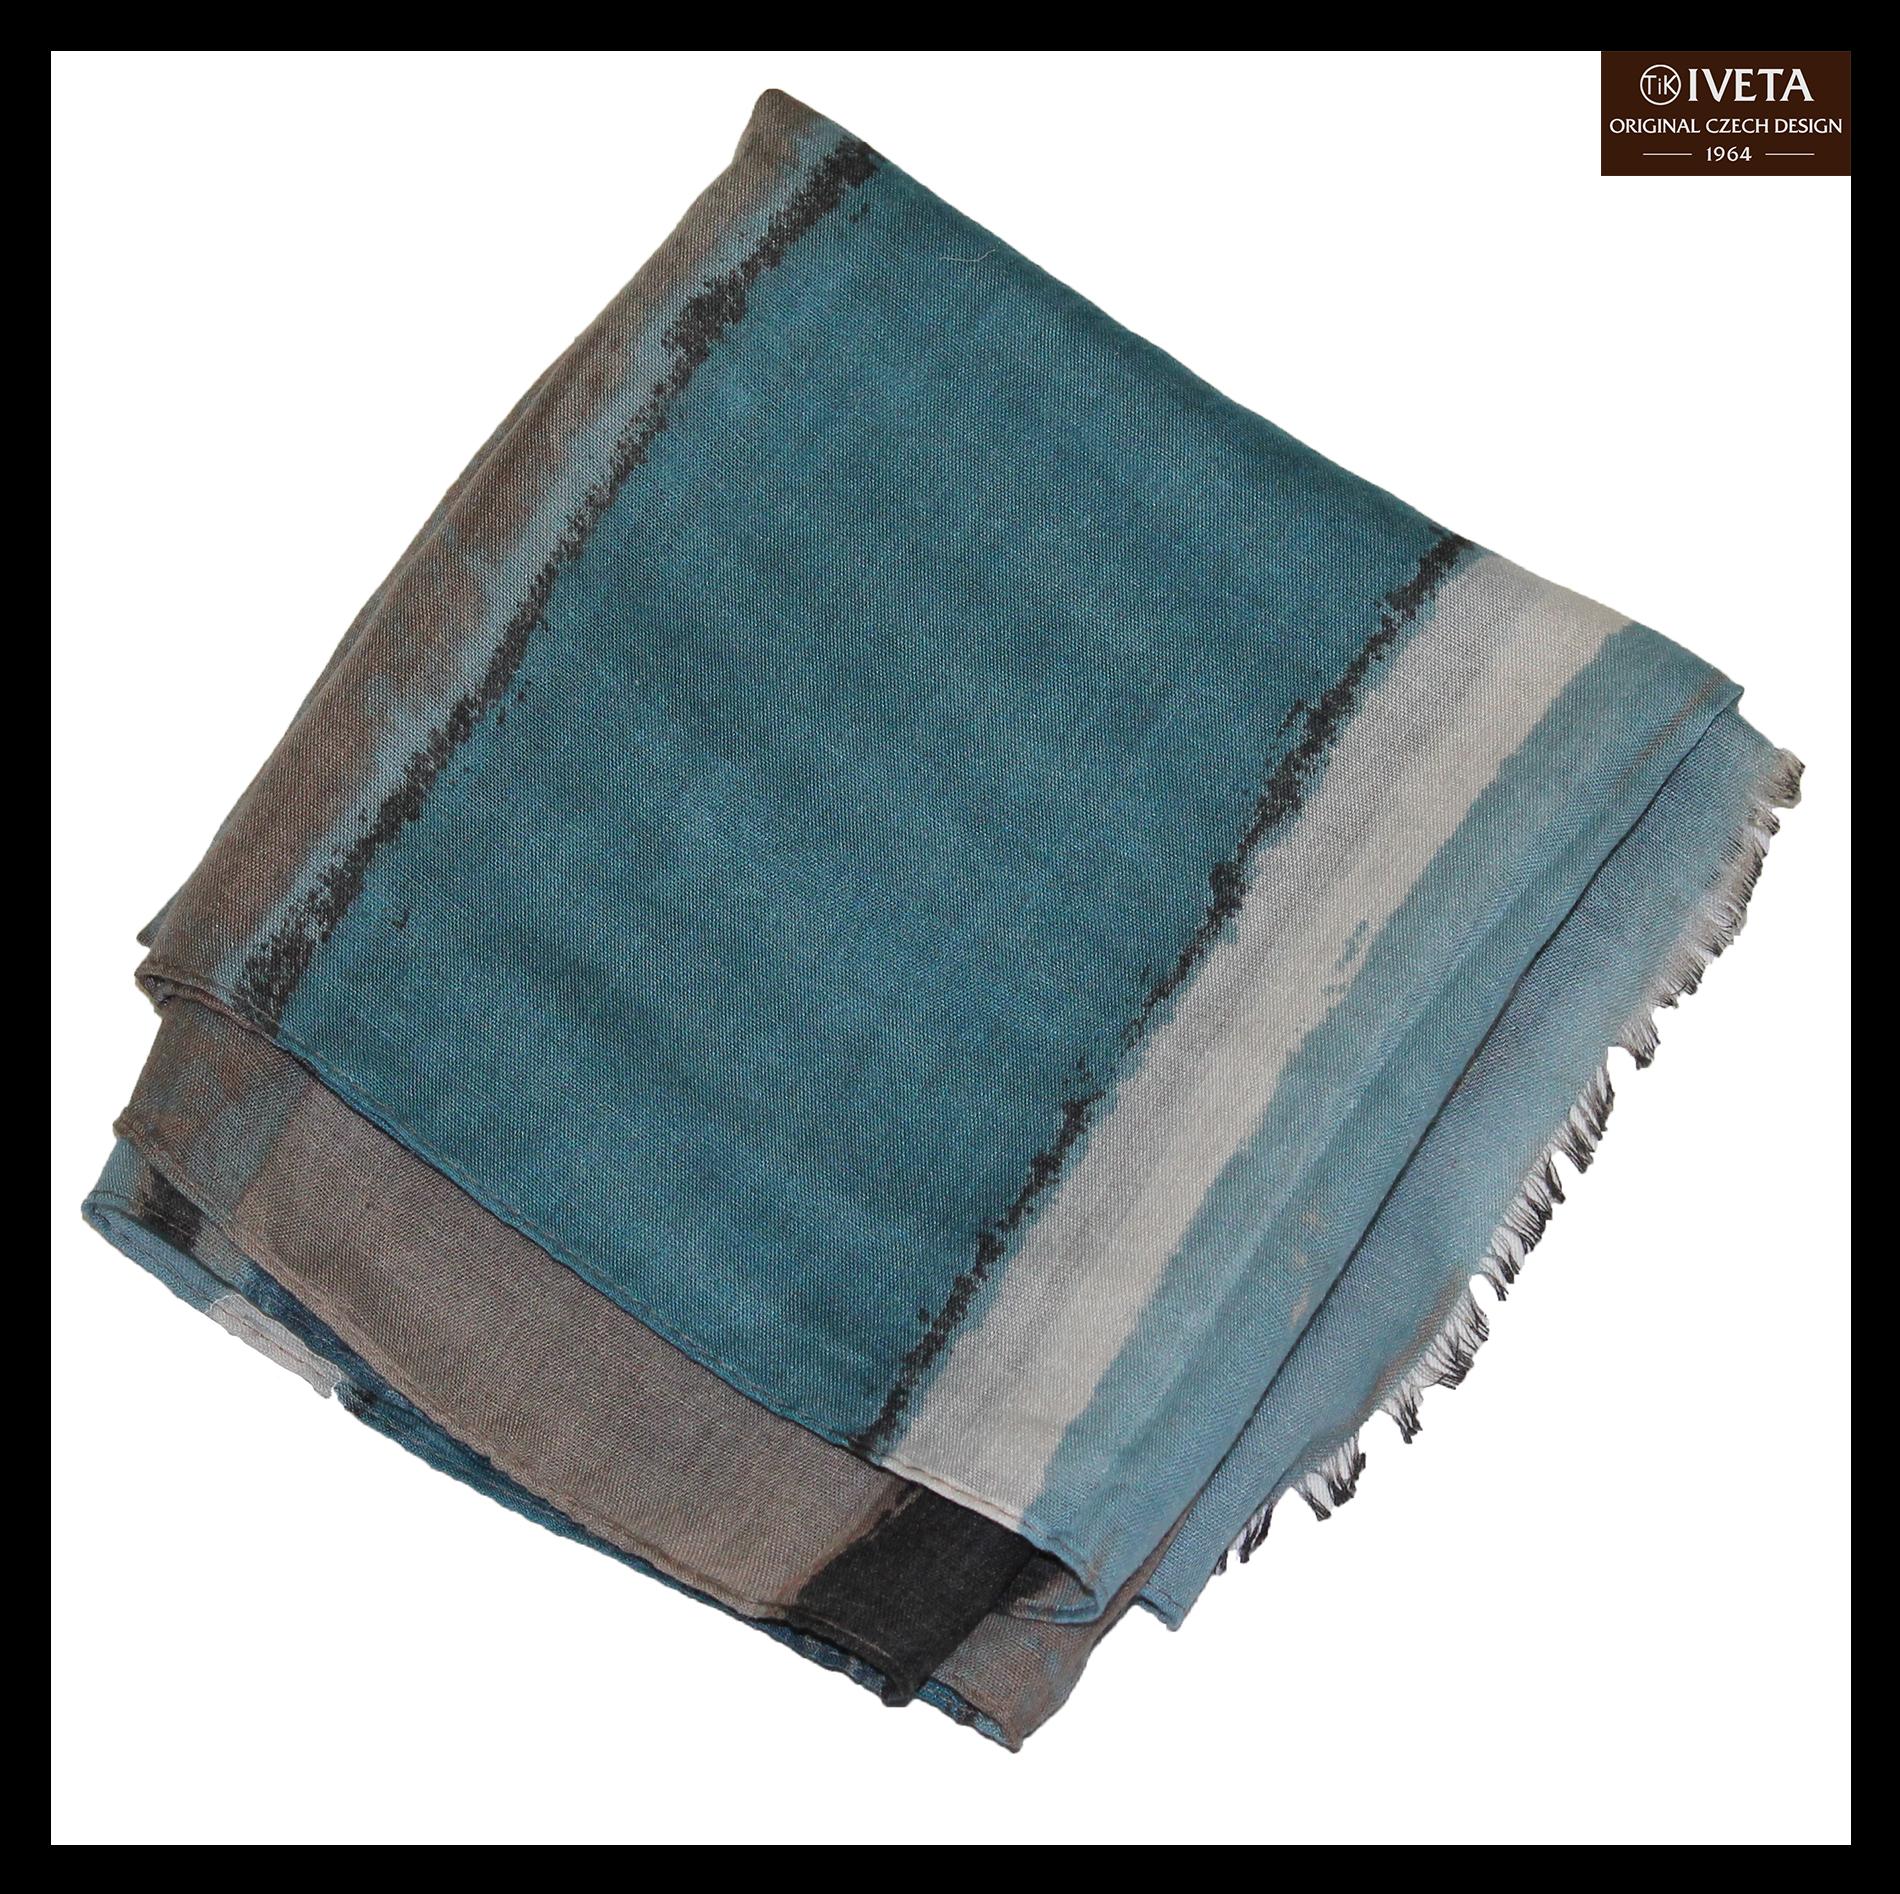 Blue-white-brown-scarf-zoom.jpg